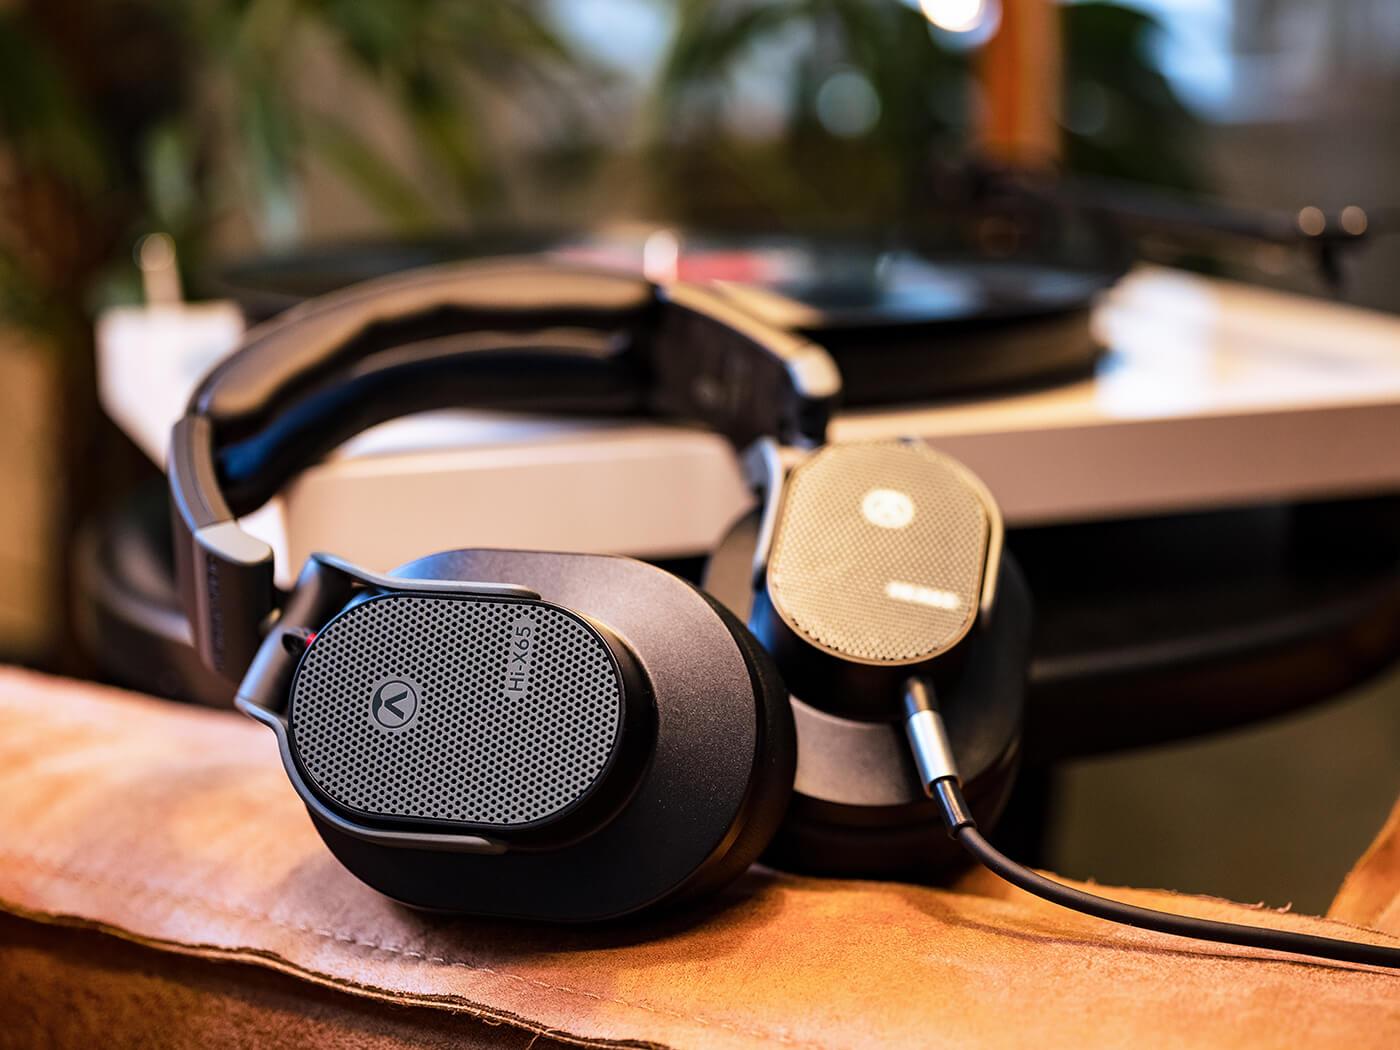 Review: Austrian Audio Hi-X65